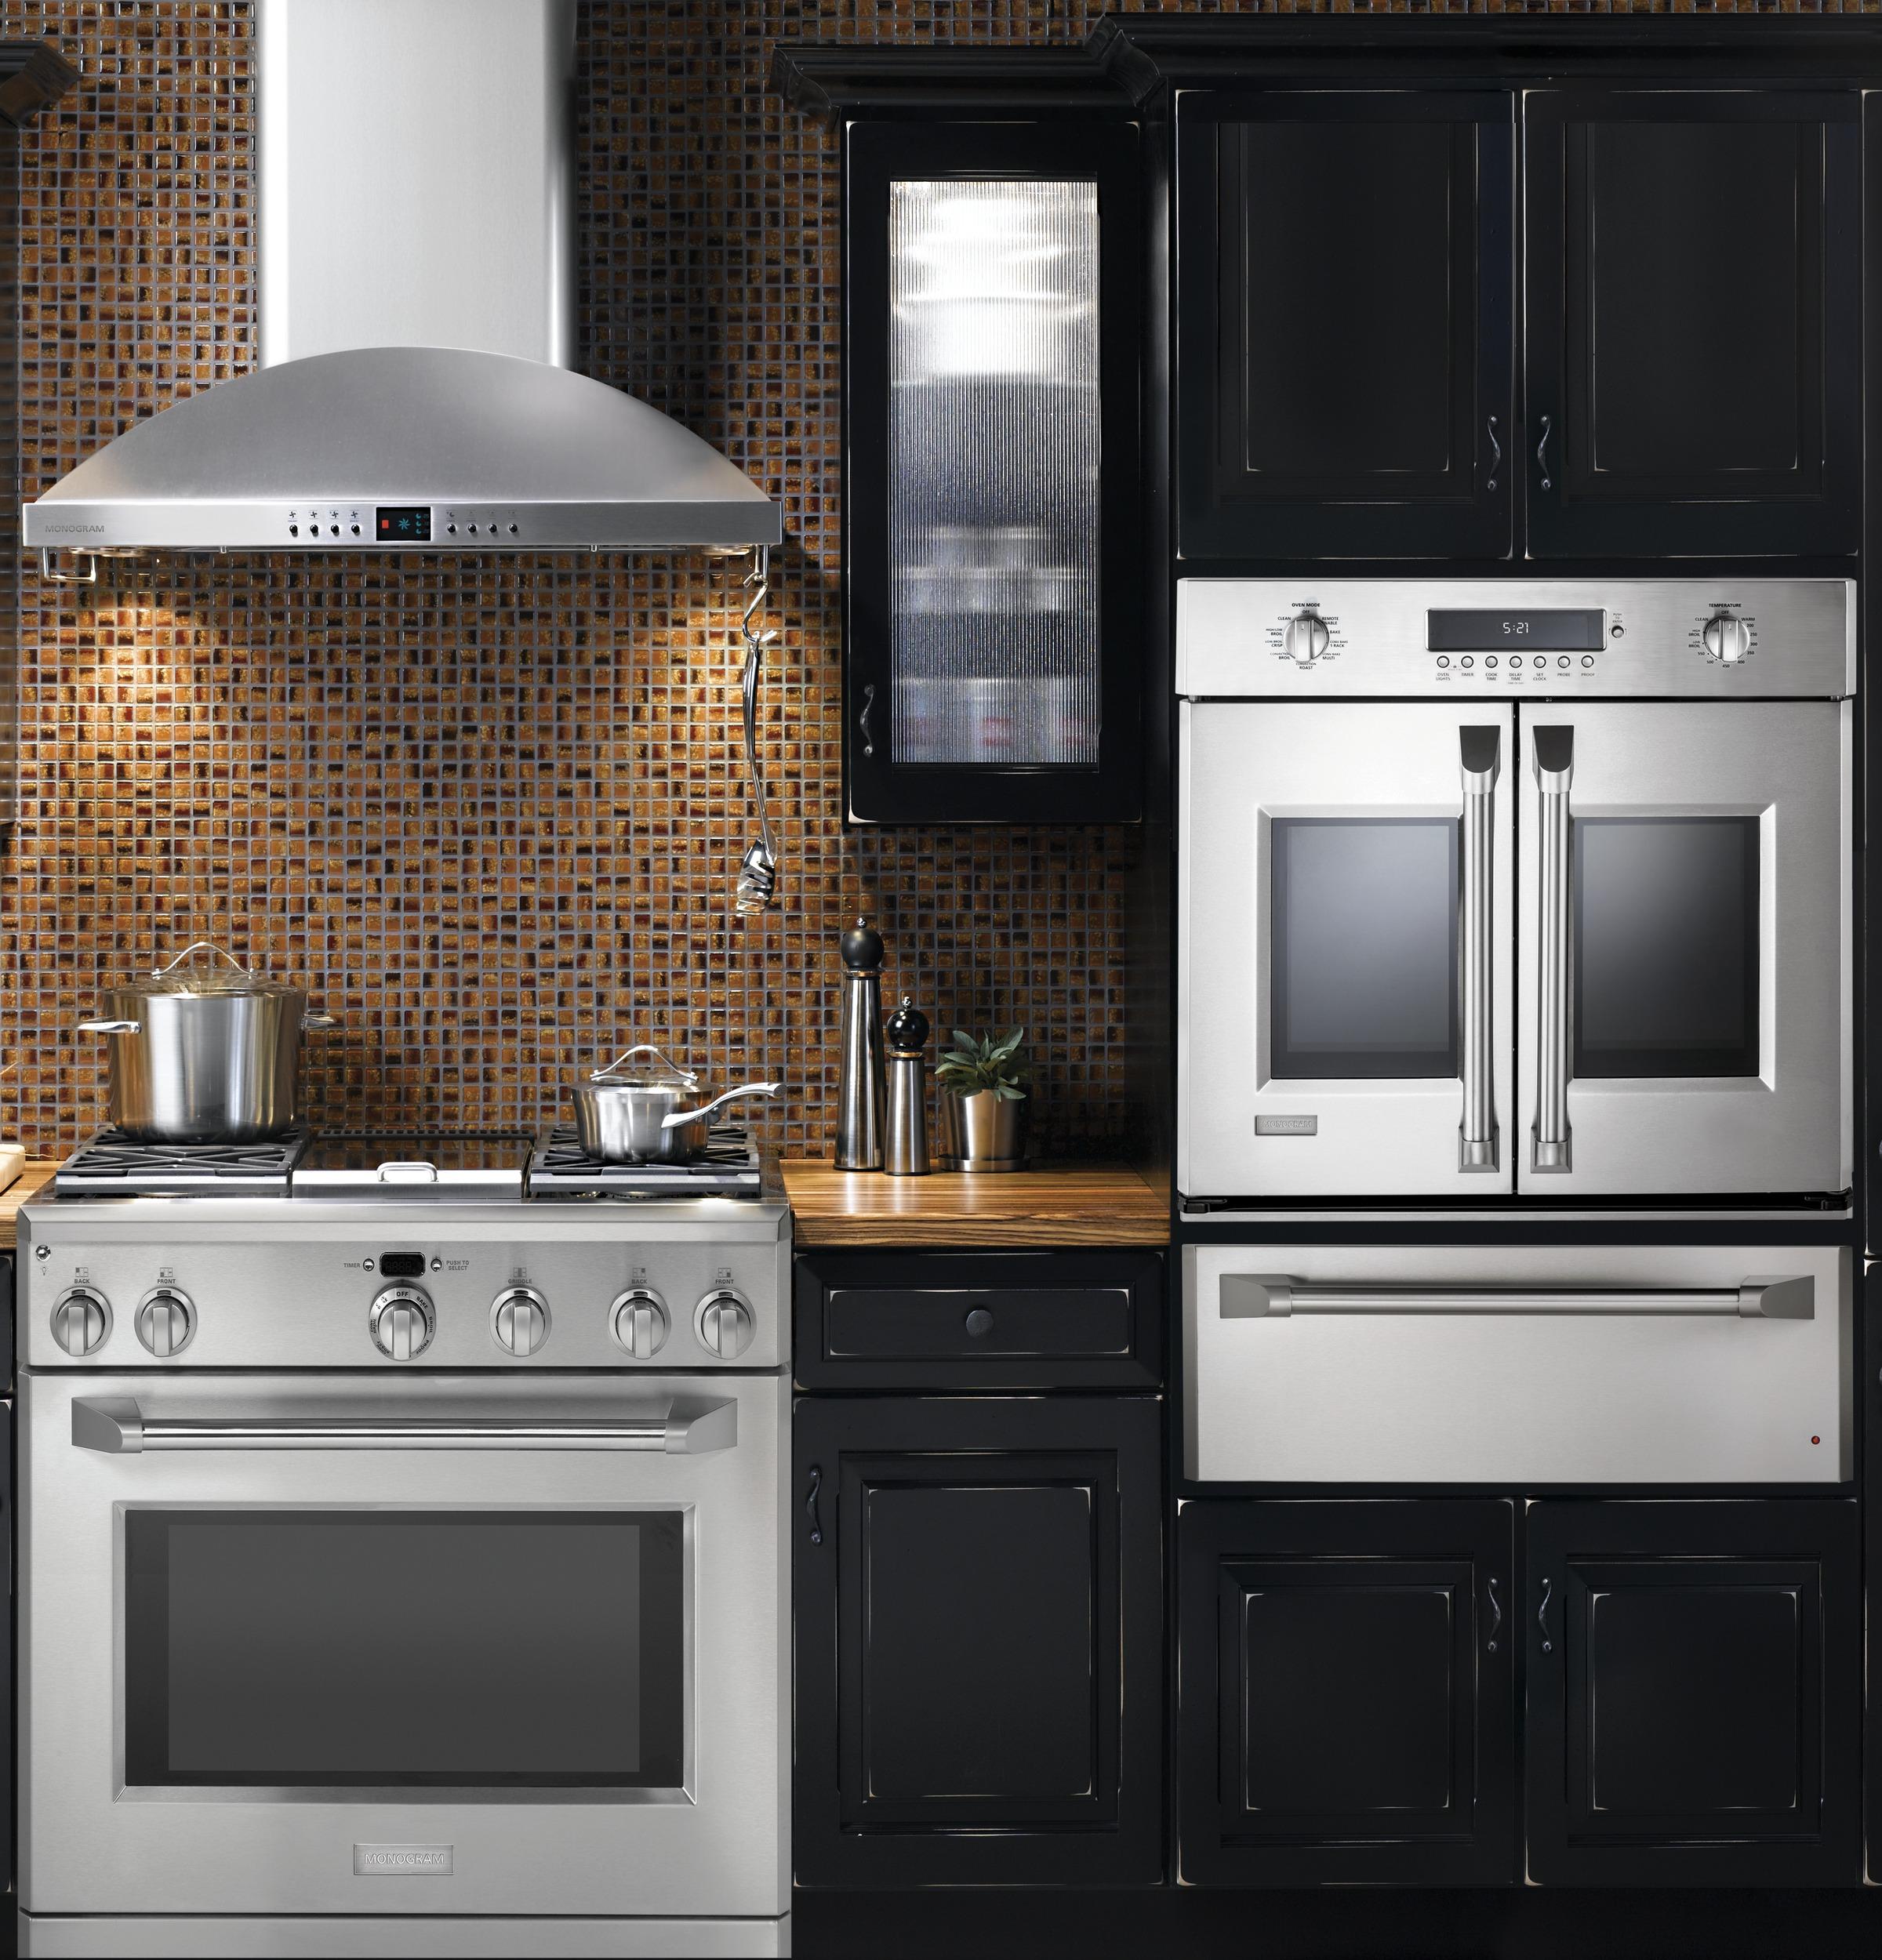 30 stainless steel warming drawer